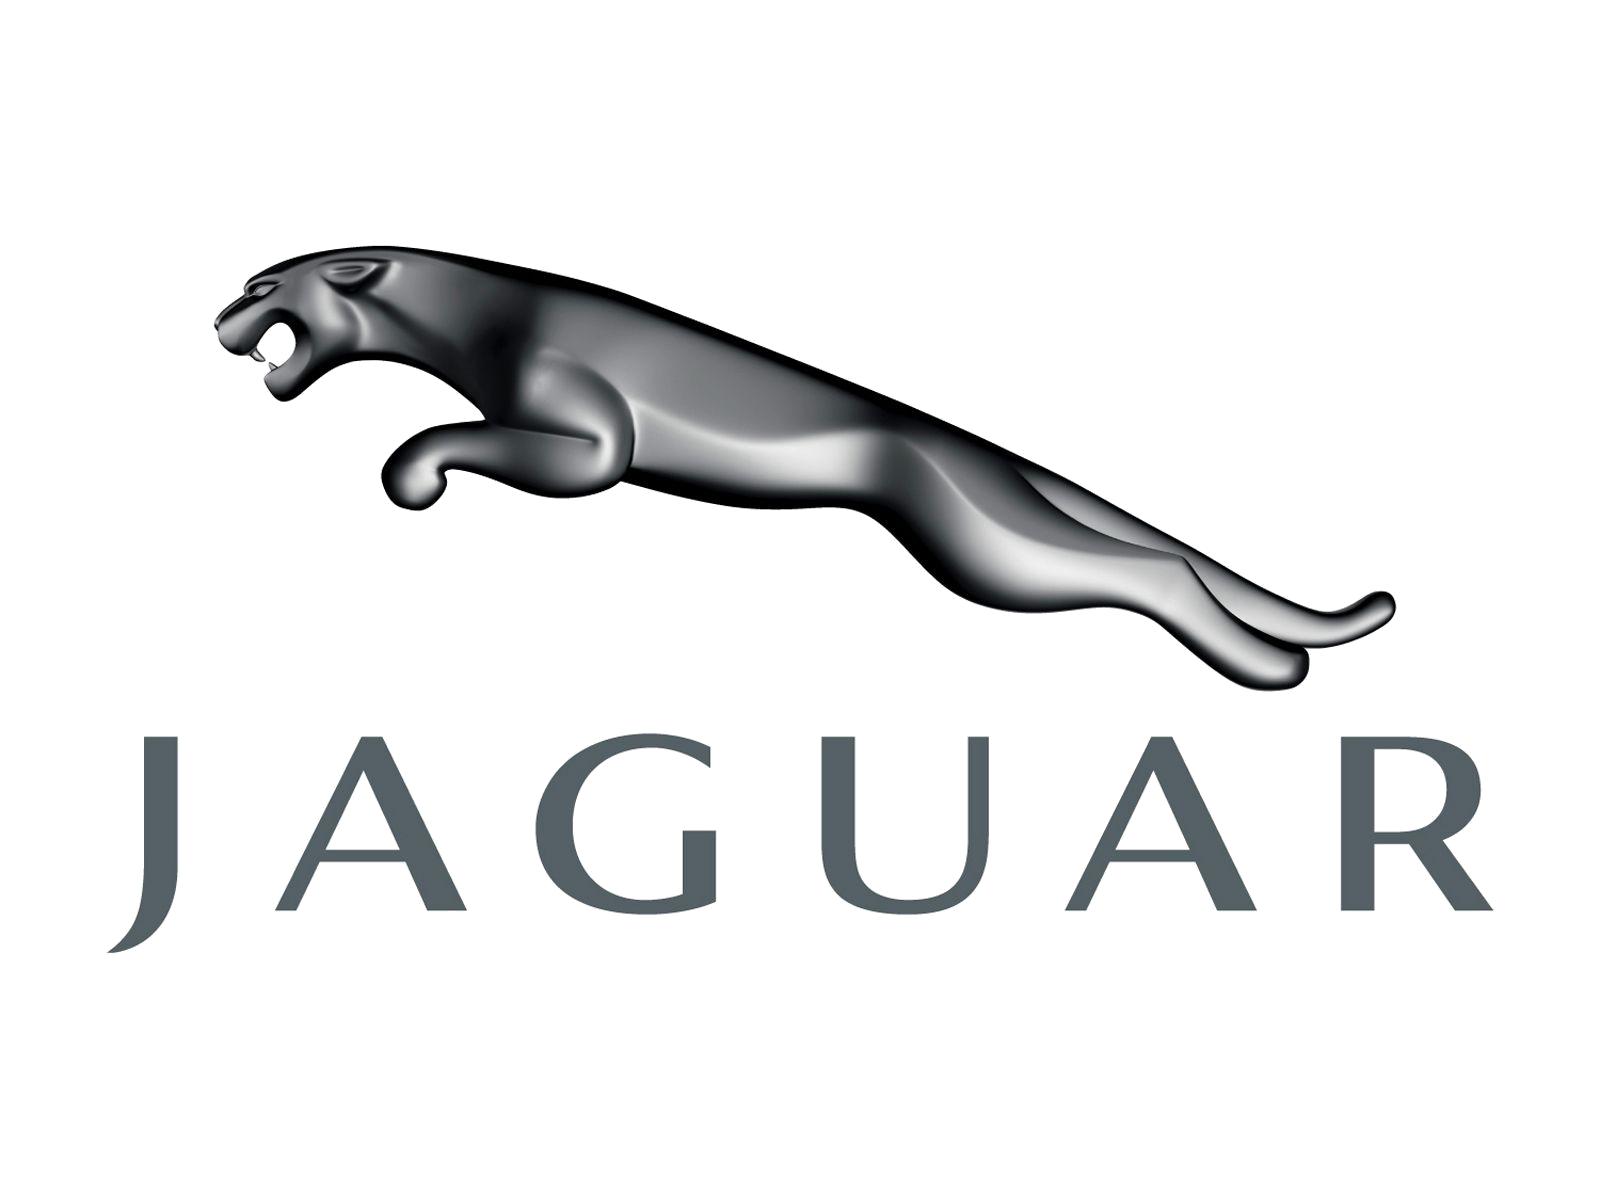 Jaguar Car Logo Png Image Purepng Free Transparent Cc0 Png Image